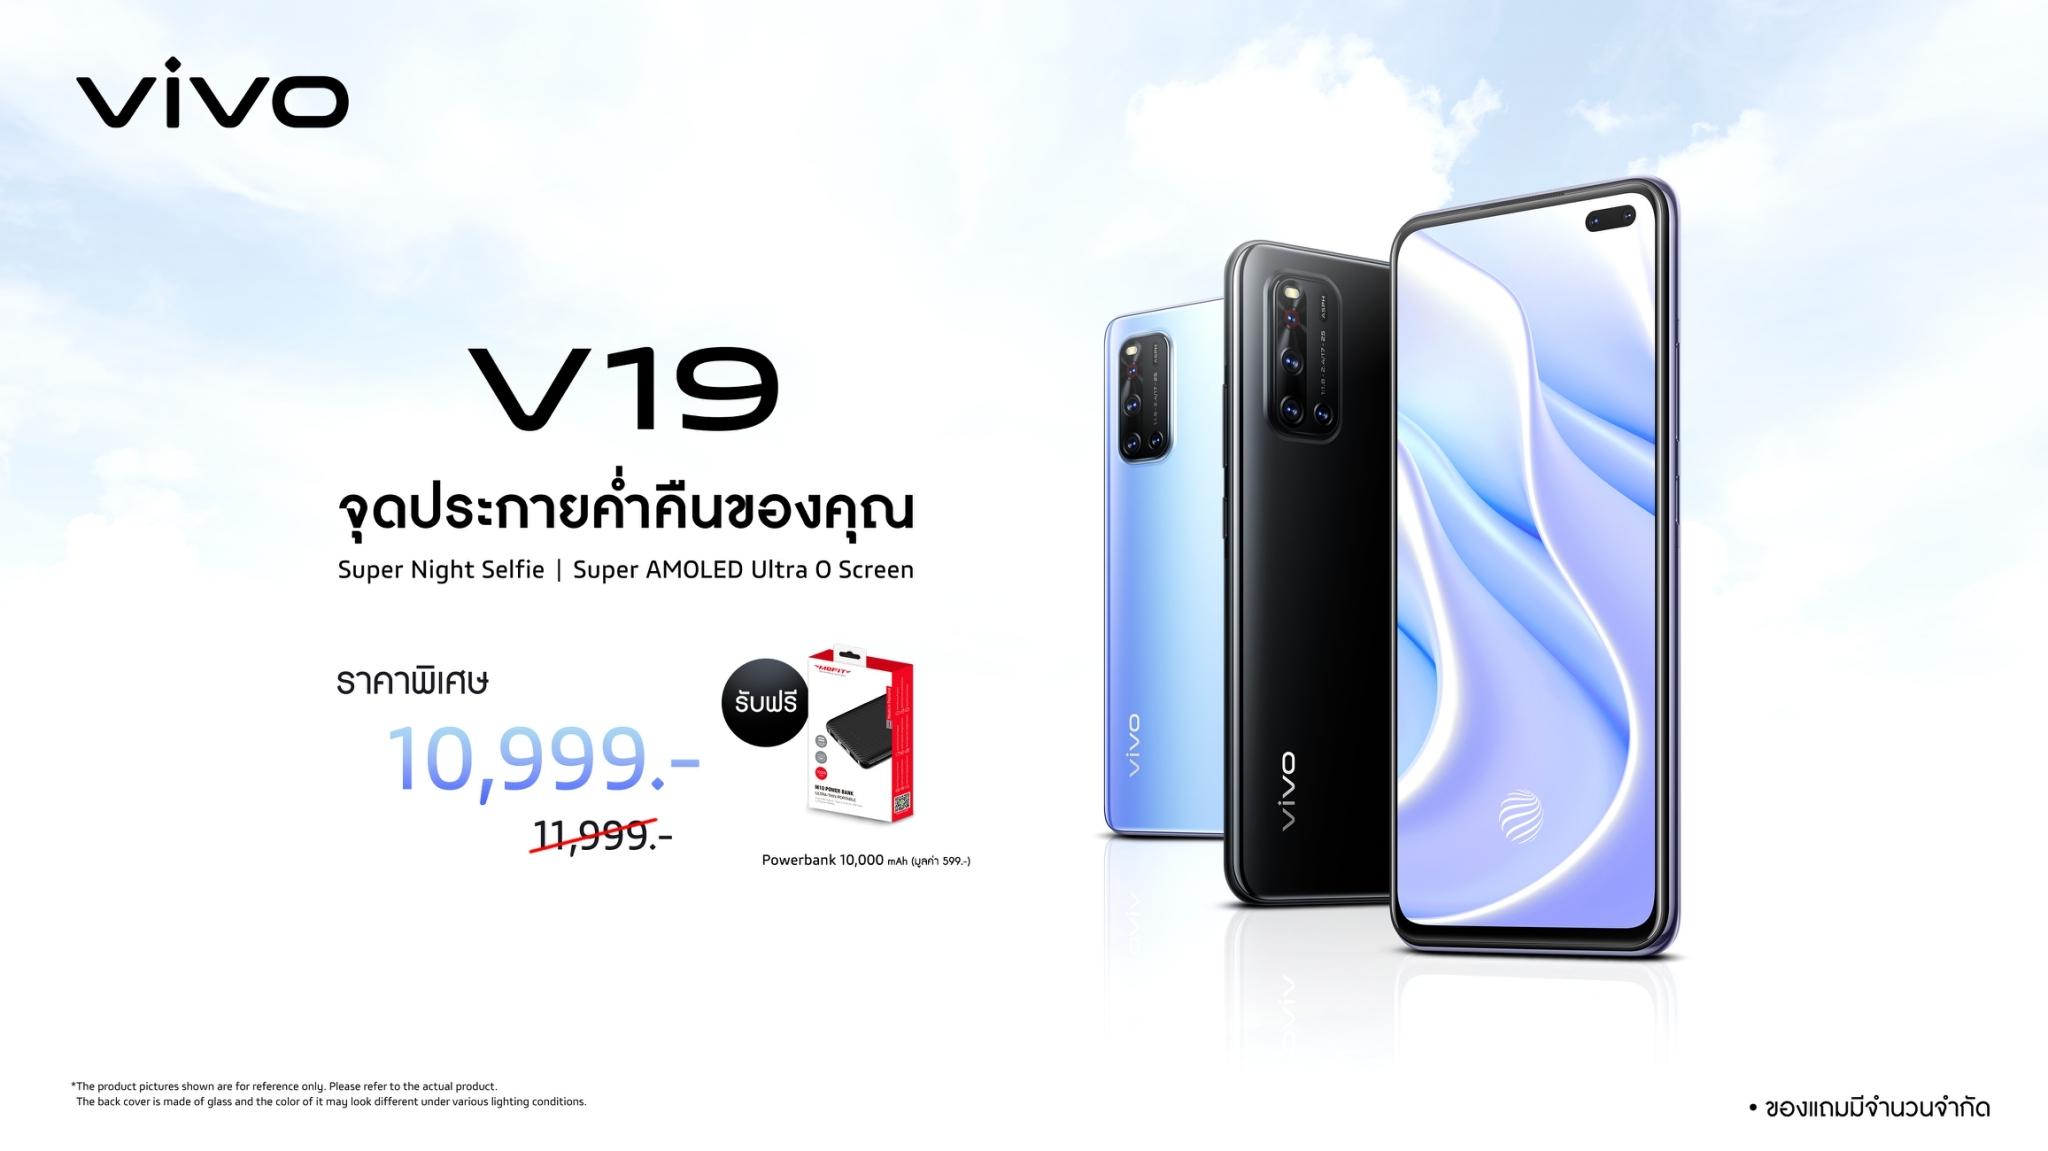 smartphones V19 Vivo มือถือ สมาร์ตโฟน